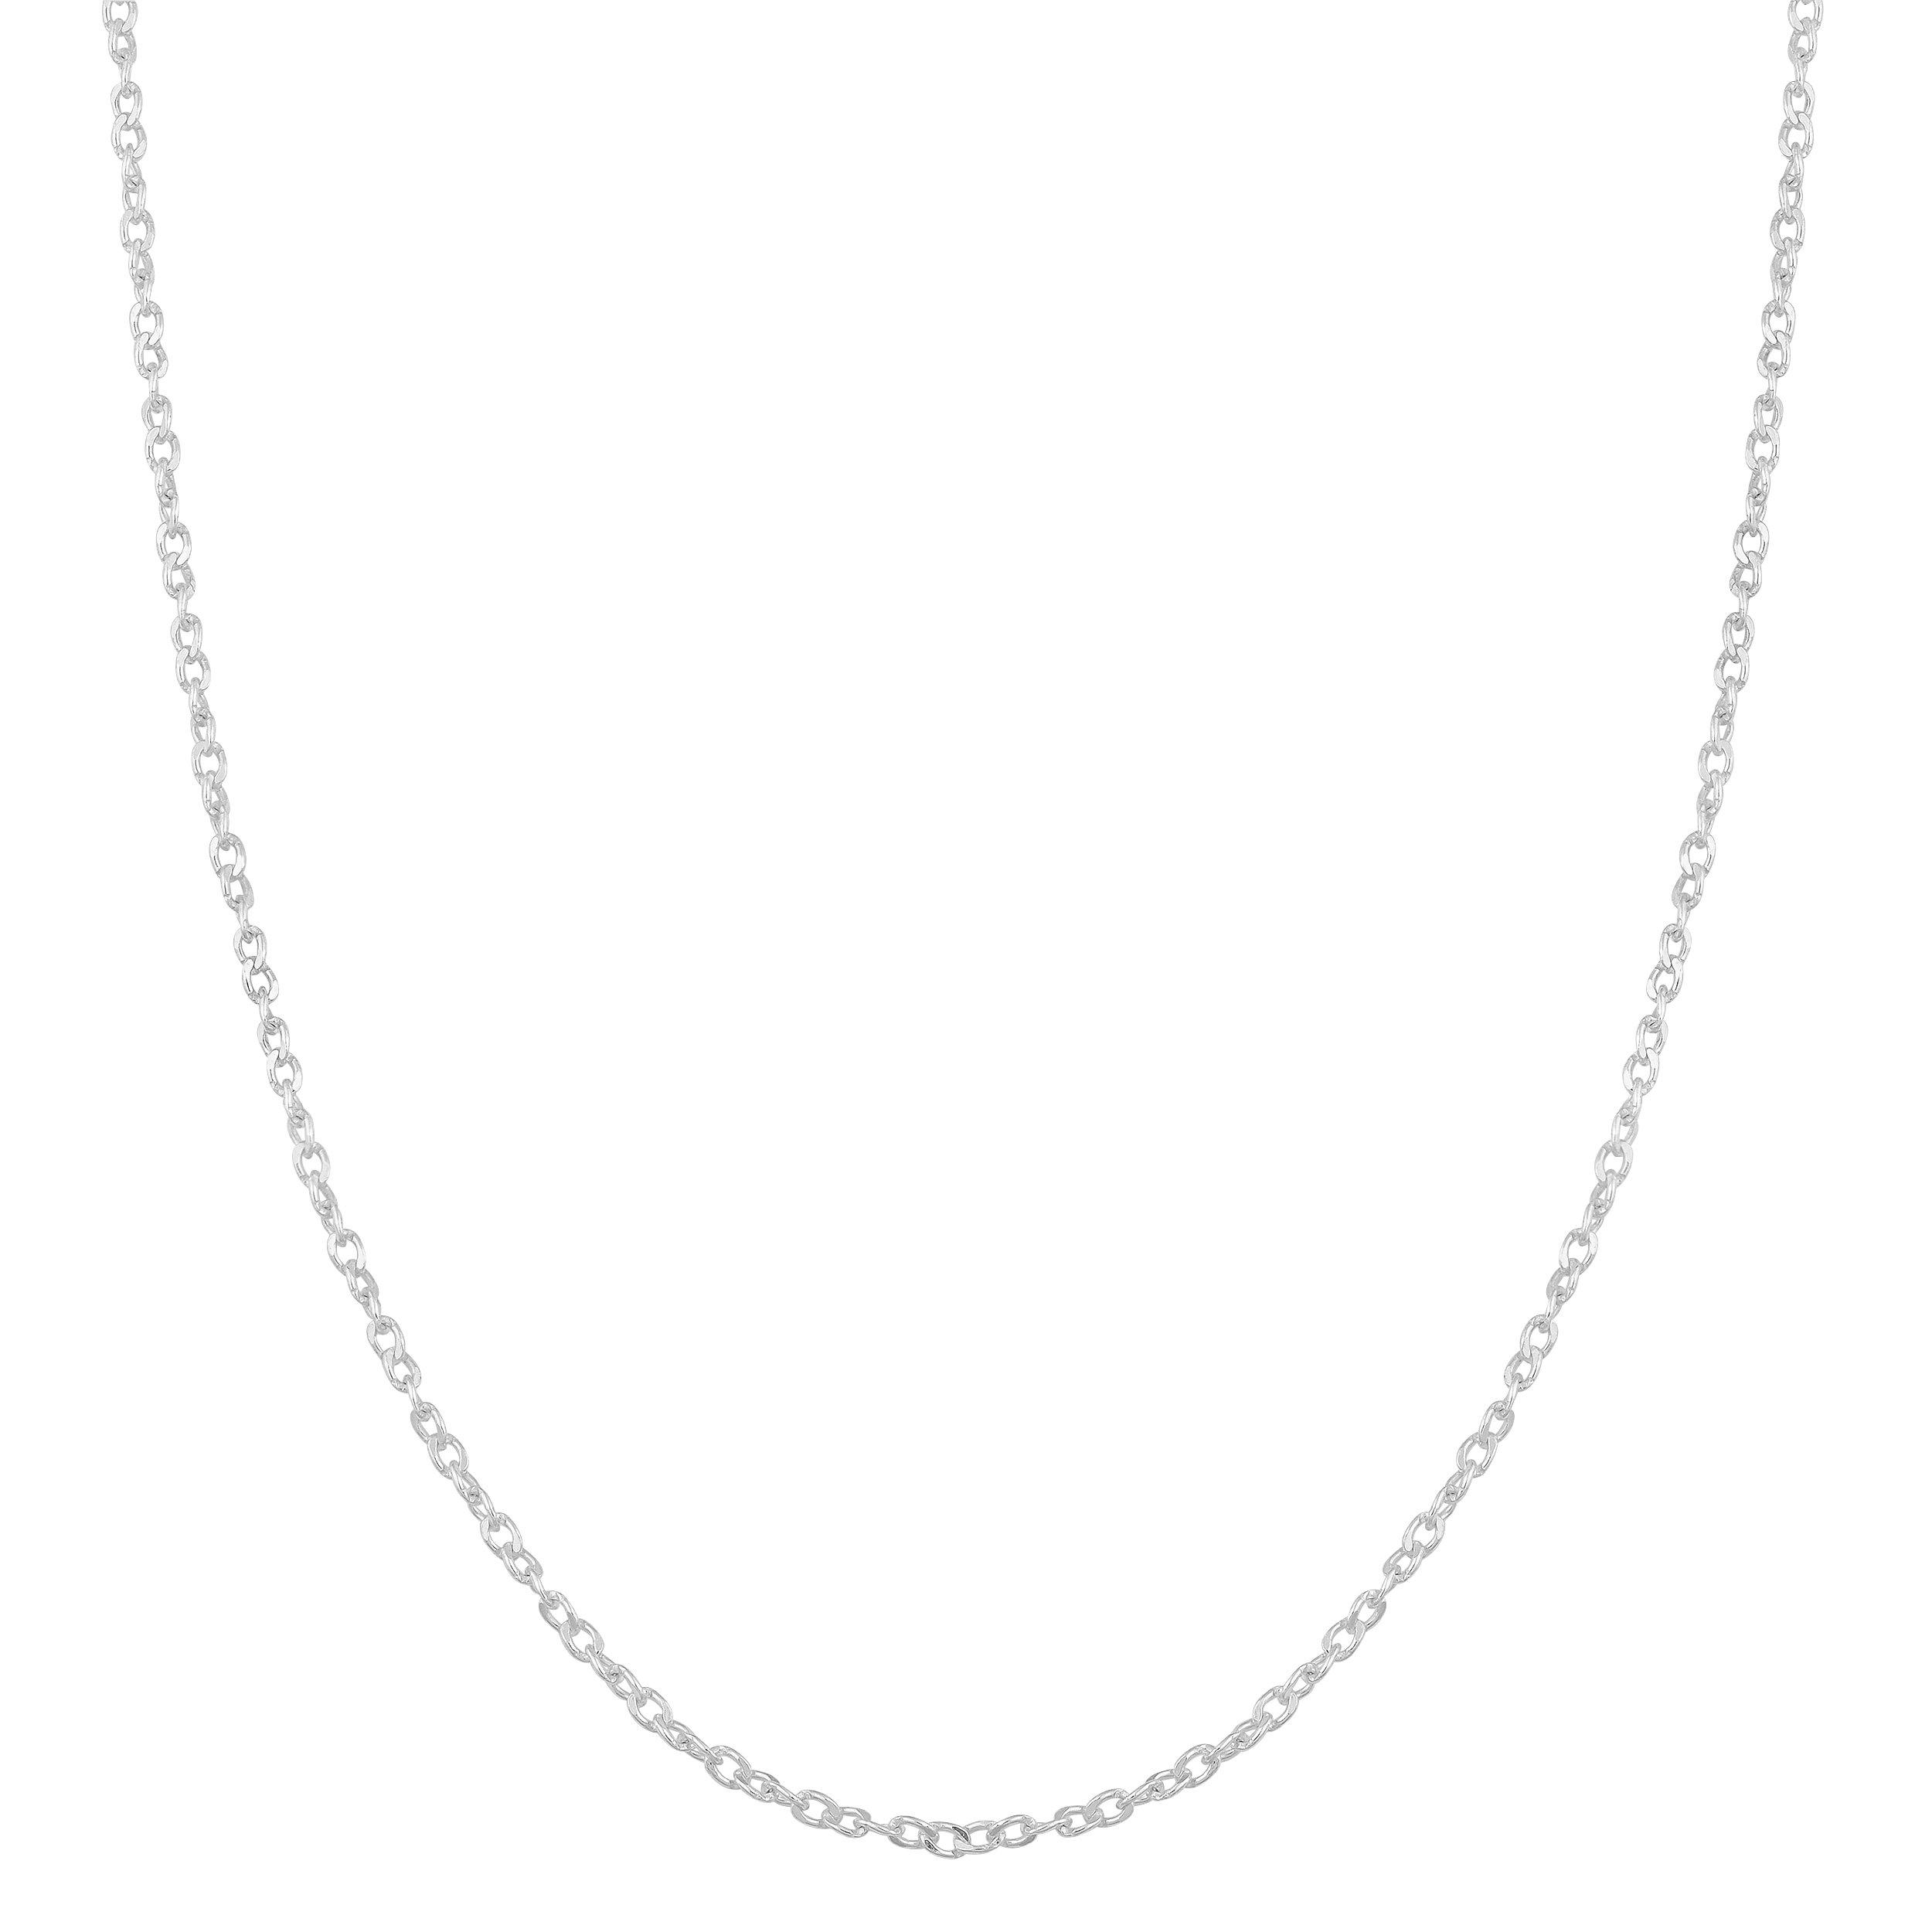 Kooljewelry Sterling Silver 1mm Twisted Curb Chain (22 inch)